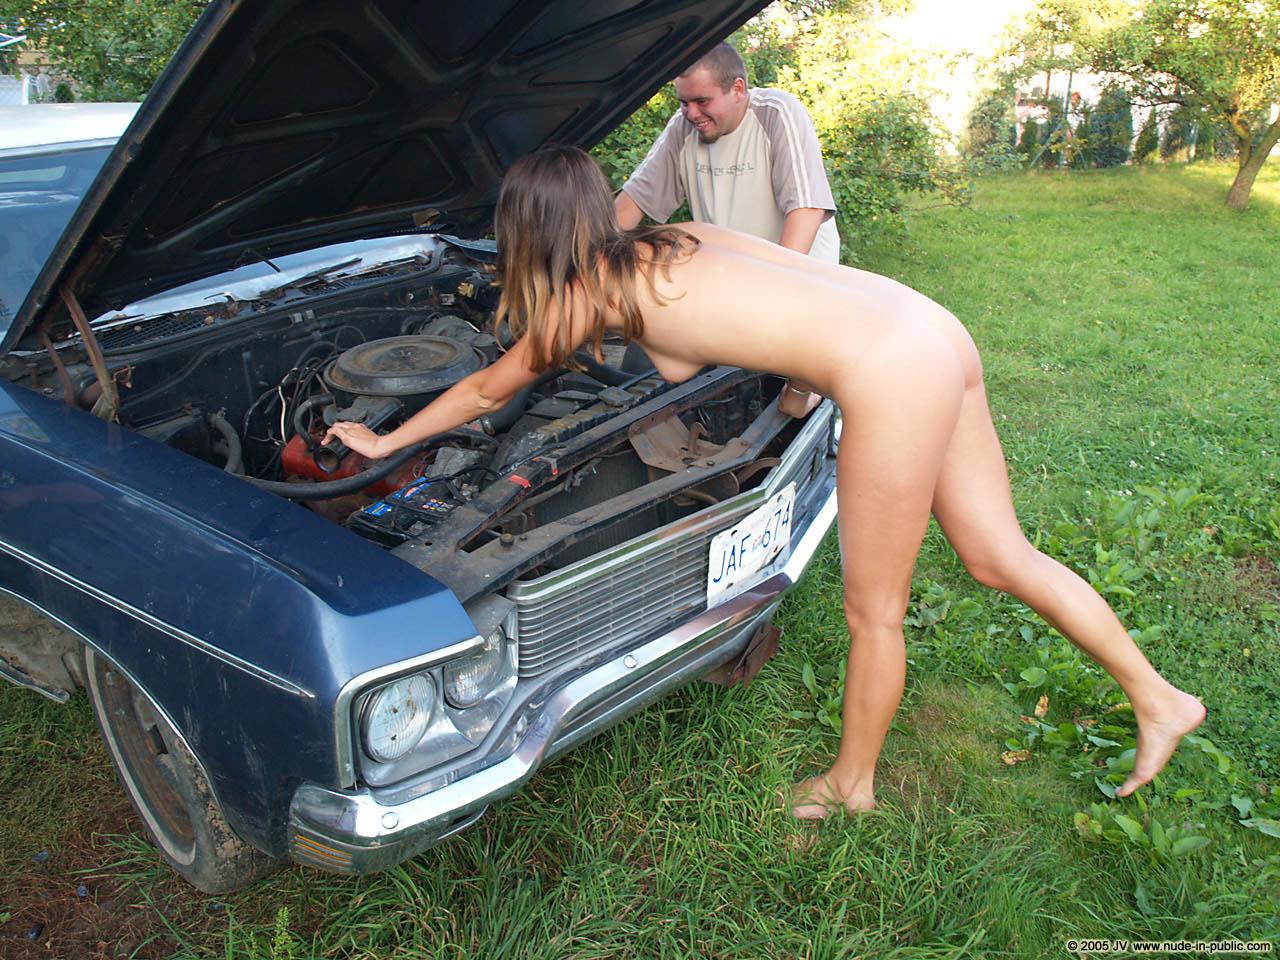 veronika-e-junkyard-cars-mechanic-nude-in-public-30